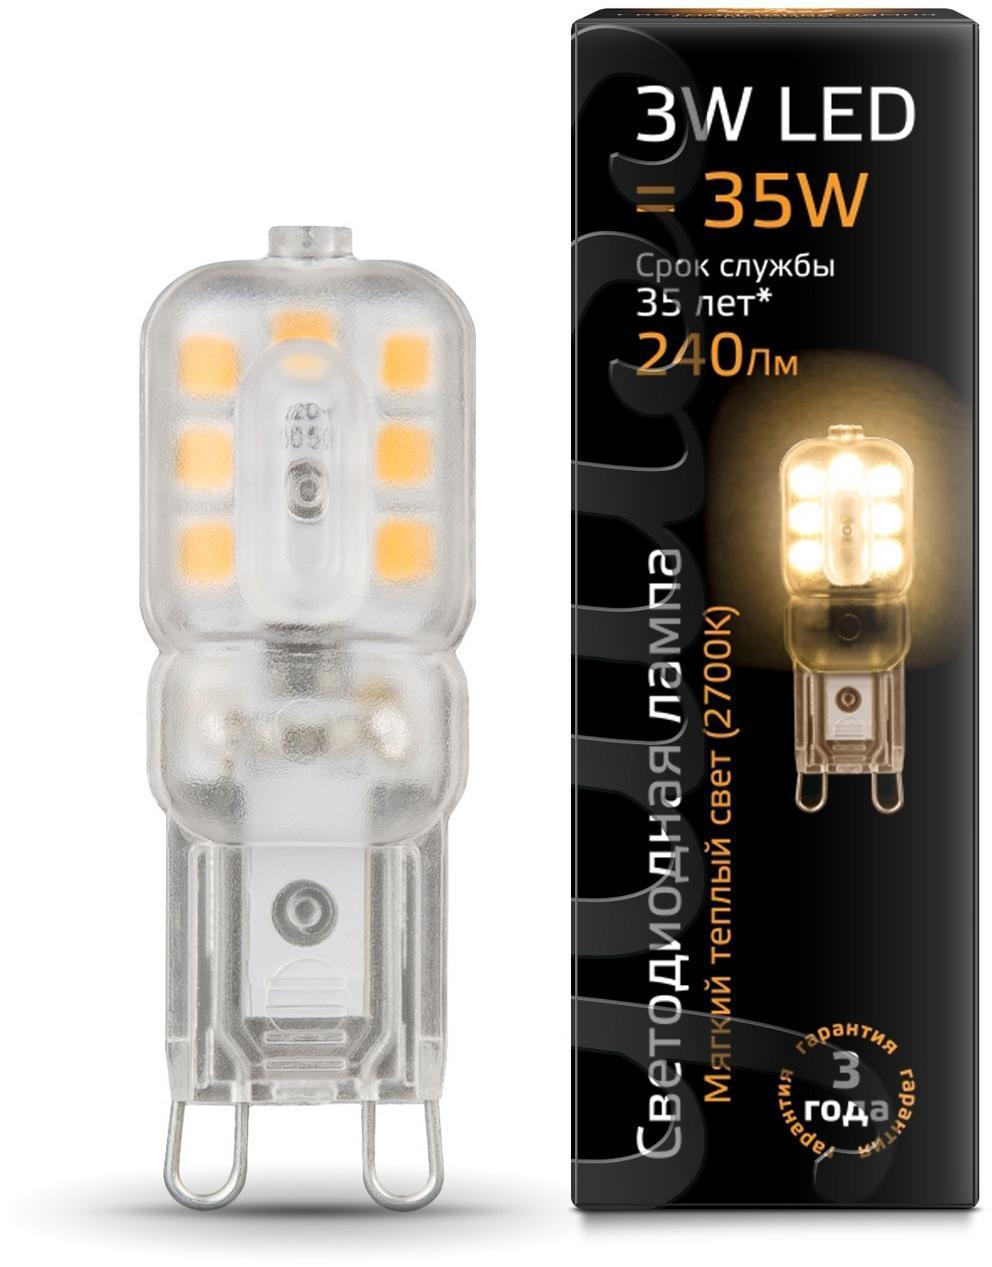 Лампа cветодиодная G9 3W 2700K прозрачная 107409103 лампа светодиодная gy6 35 3w 2700k прозрачная 107719103